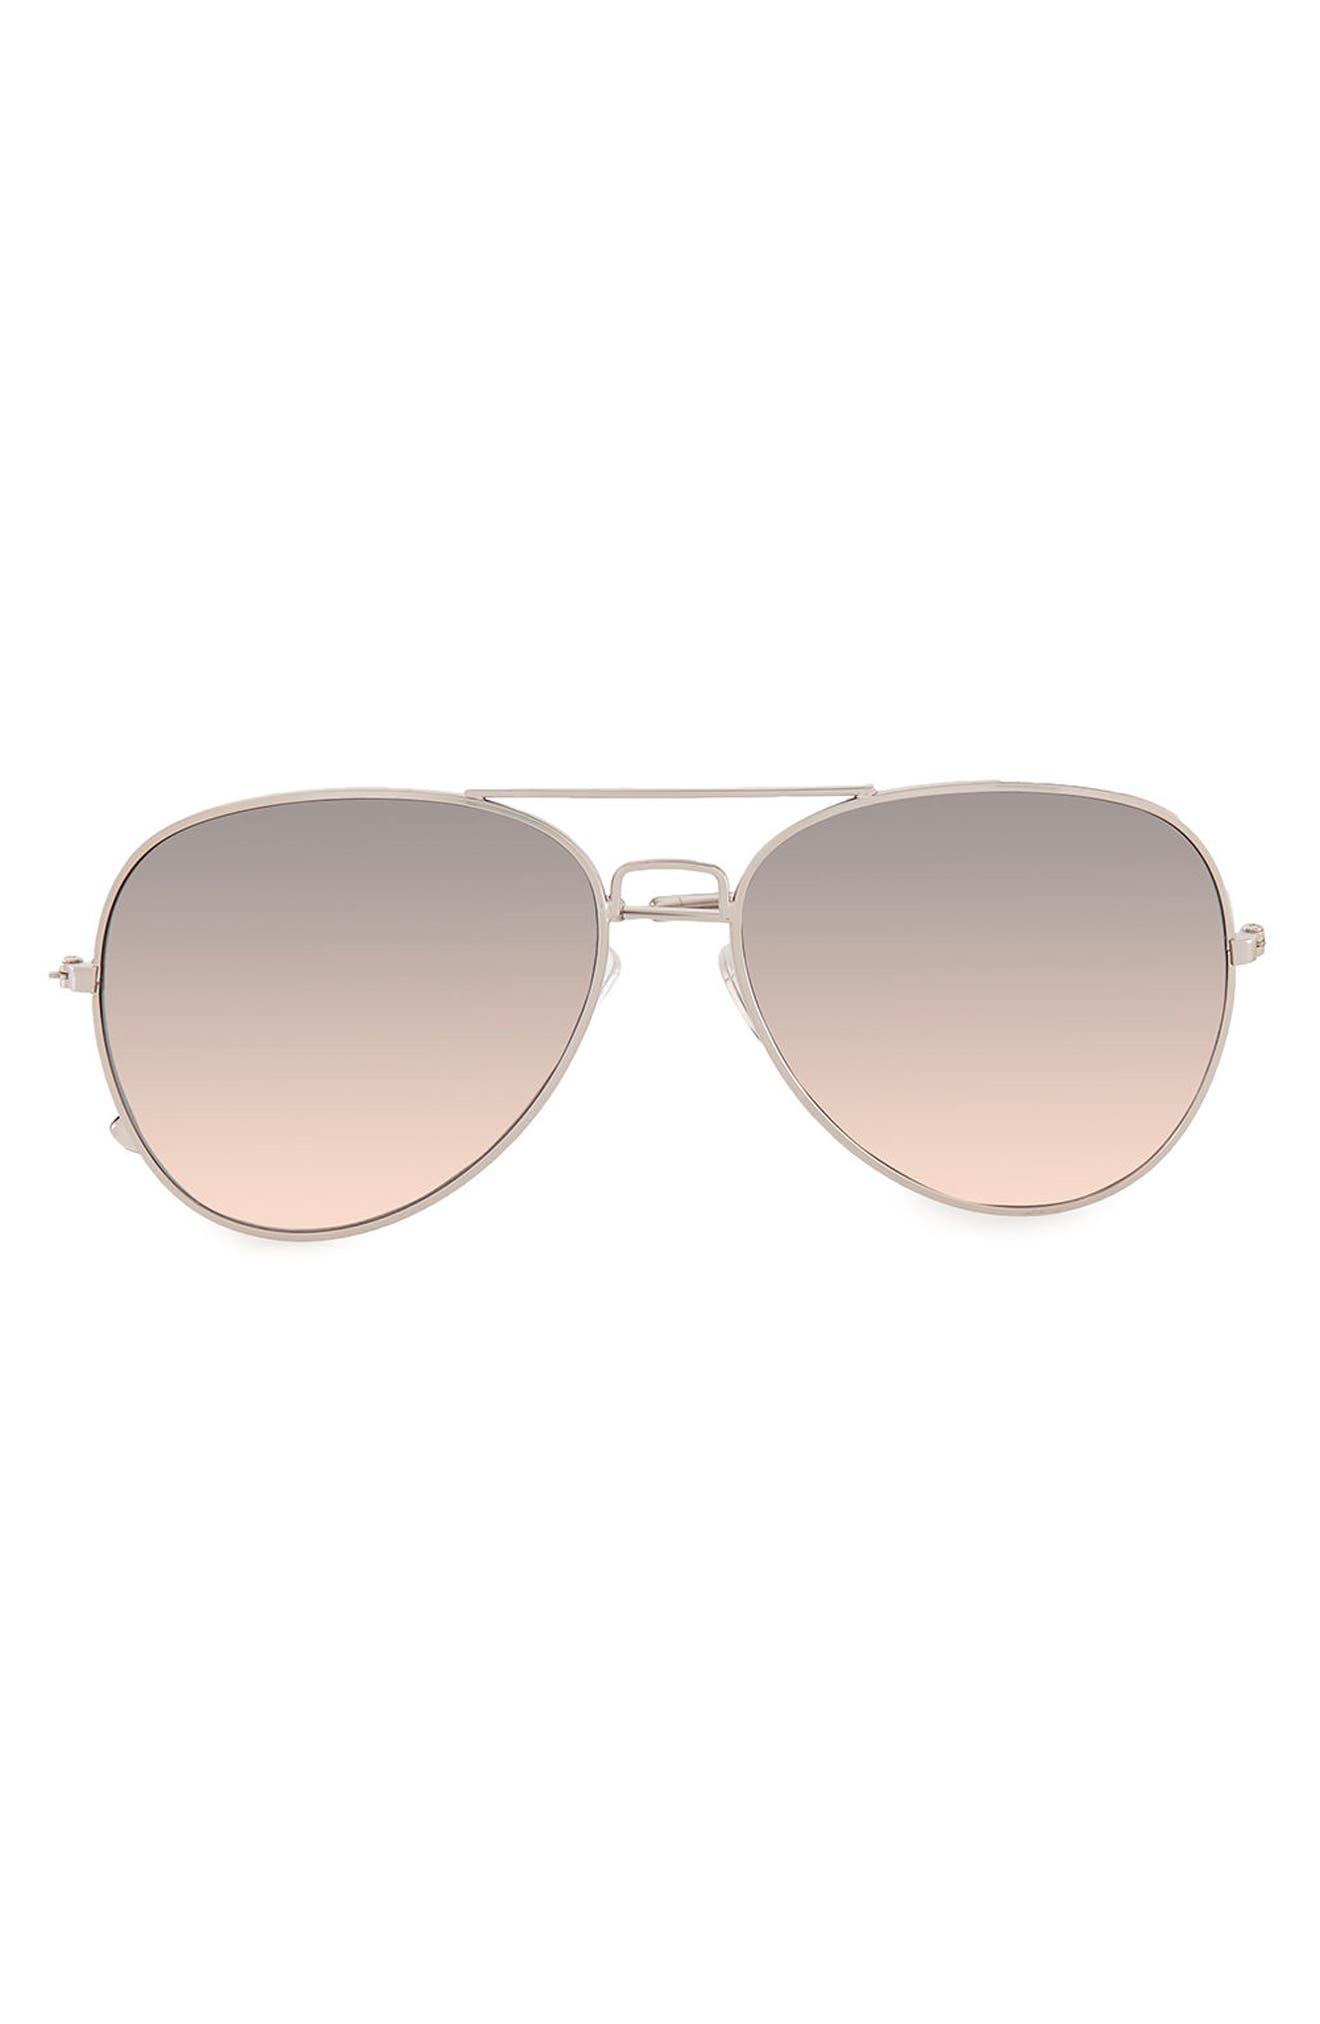 Alternate Image 1 Selected - Topman 58mm Mirrored Aviator Sunglasses